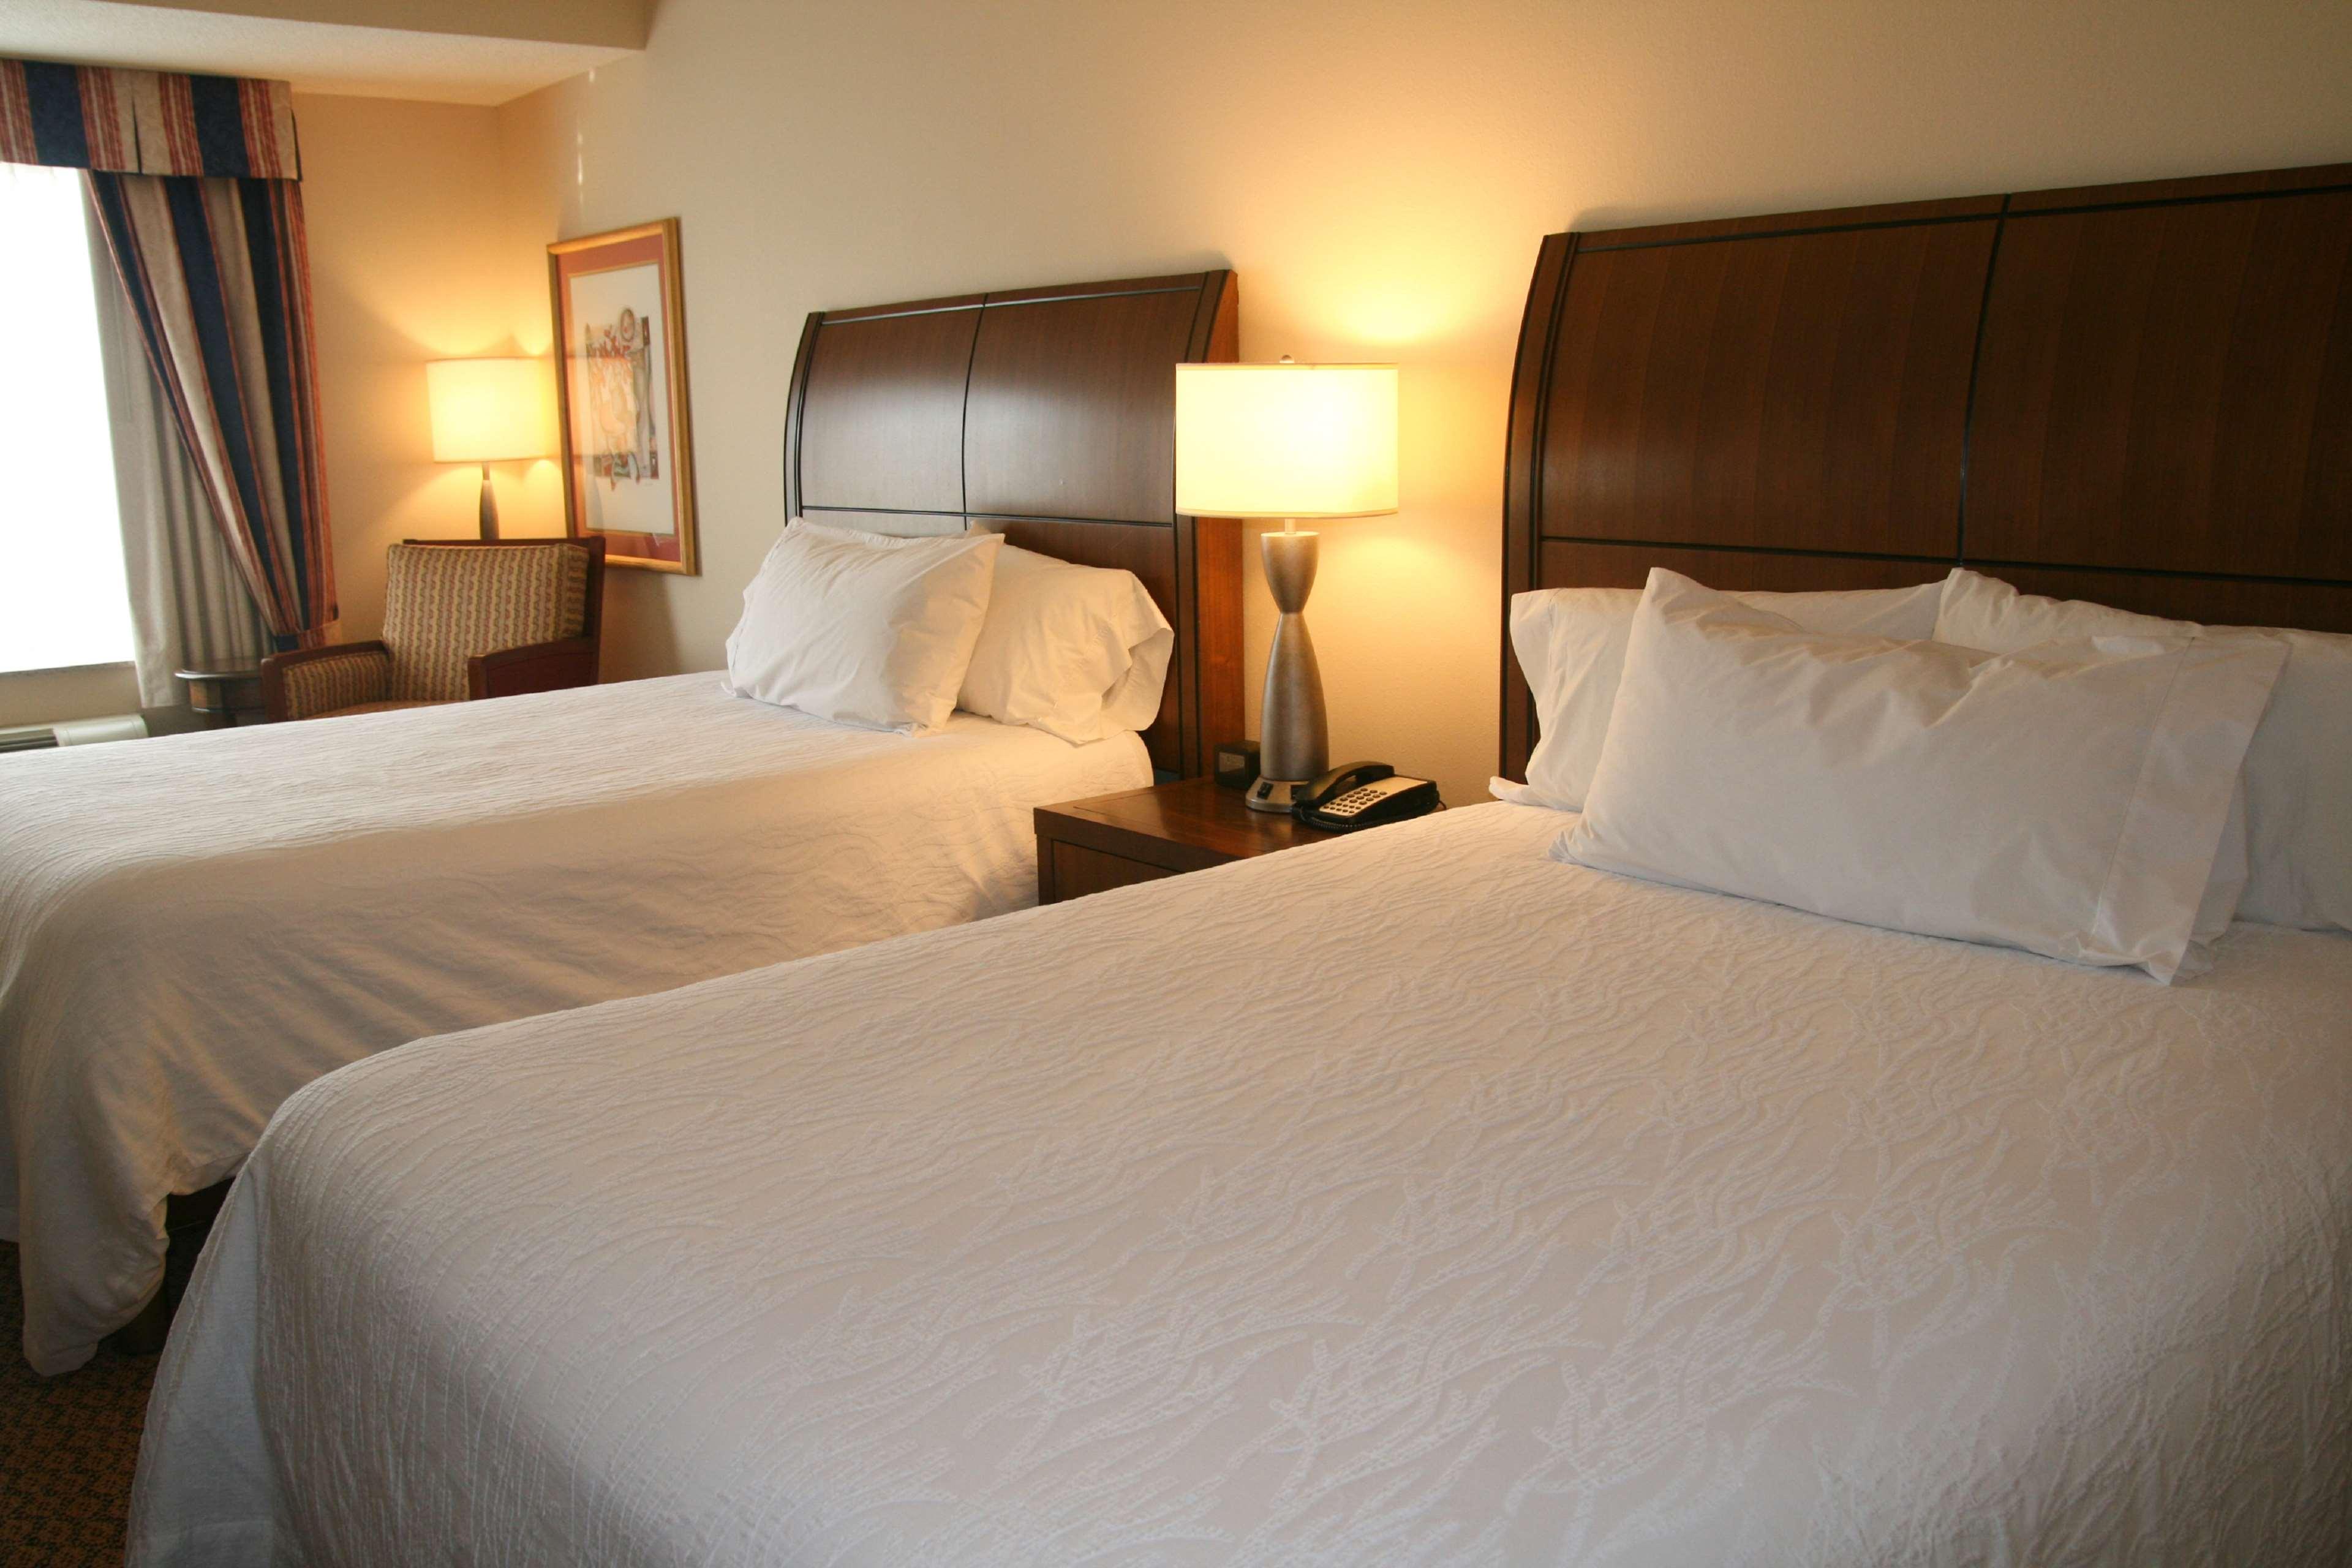 Hilton Garden Inn Elmira/Corning image 25